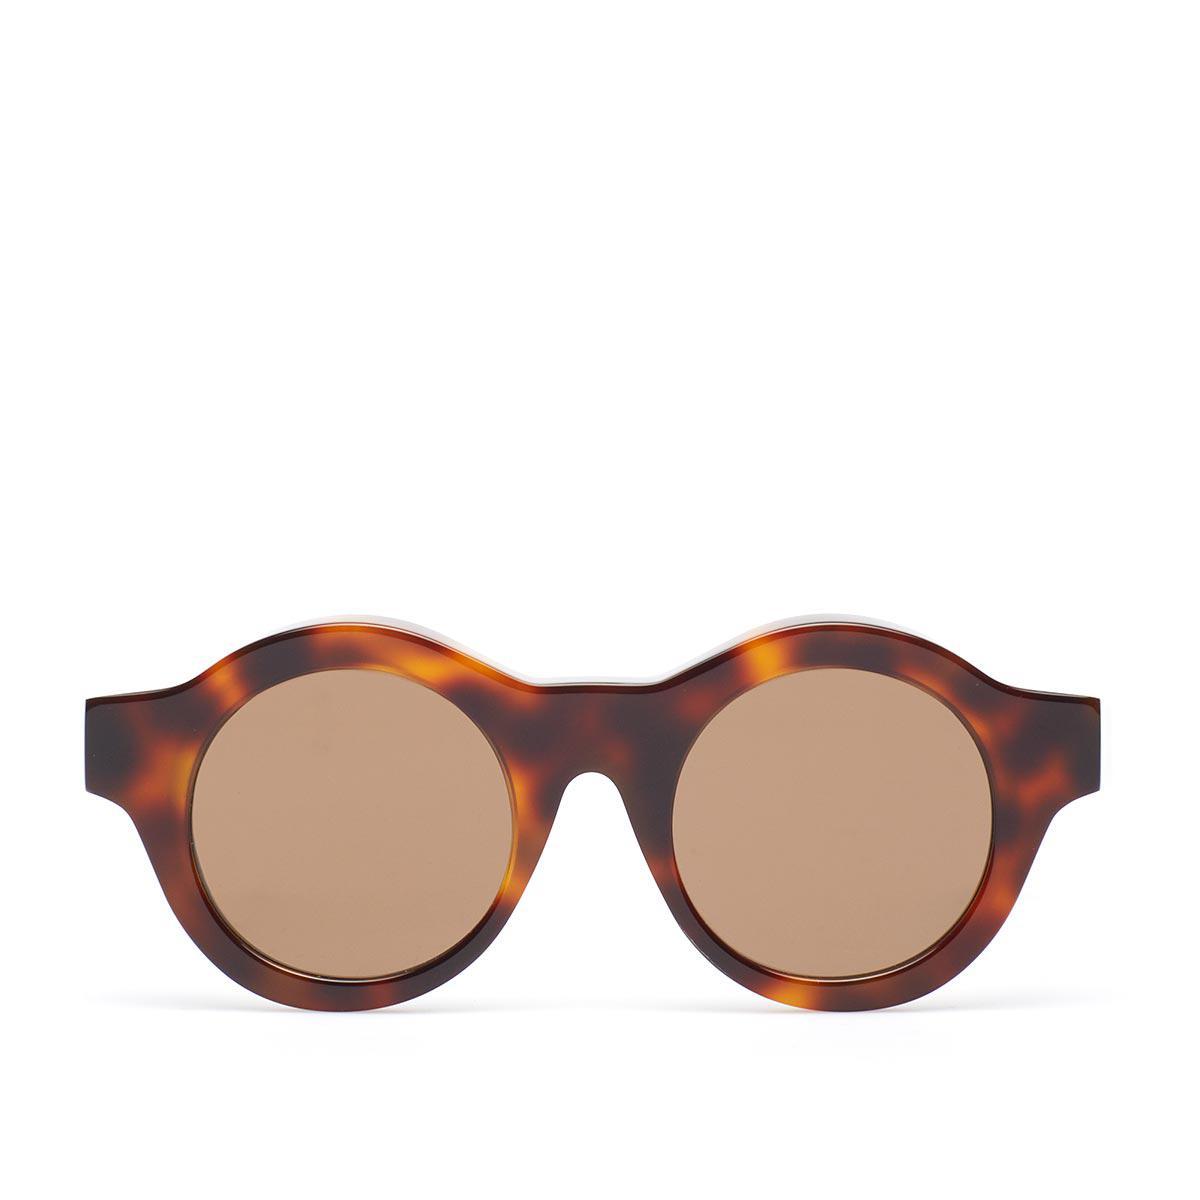 a3f0afc5f82 Lyst - Kuboraum A1 Hs Sunglasses in Black for Men